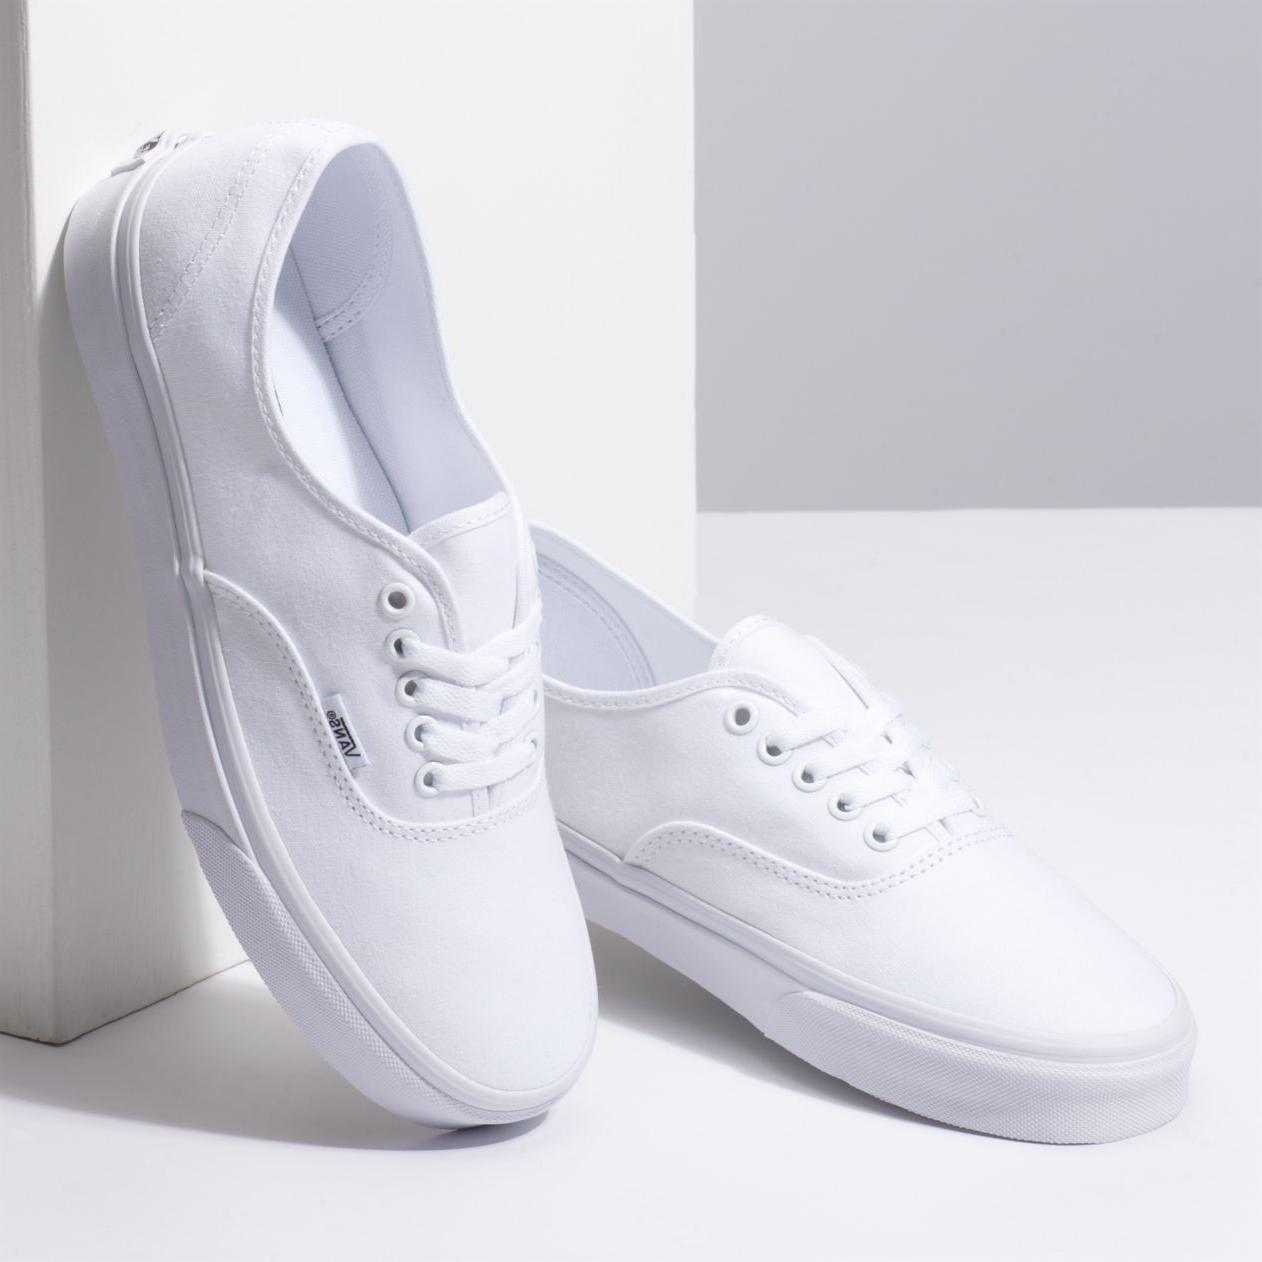 New & White Era Canvas Shoes